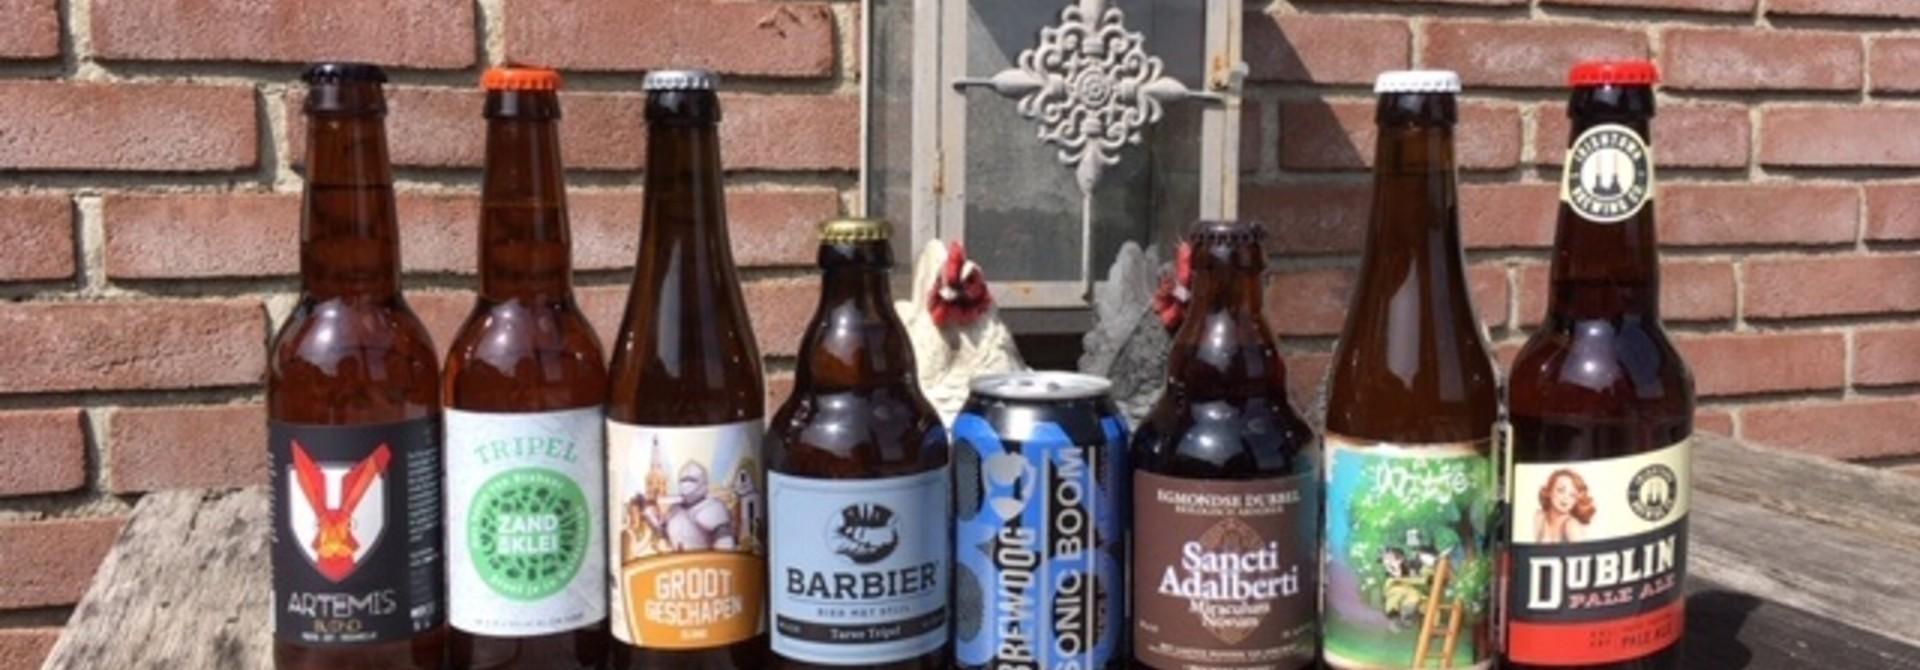 Speciaalbier – bierpakket augustus 2019